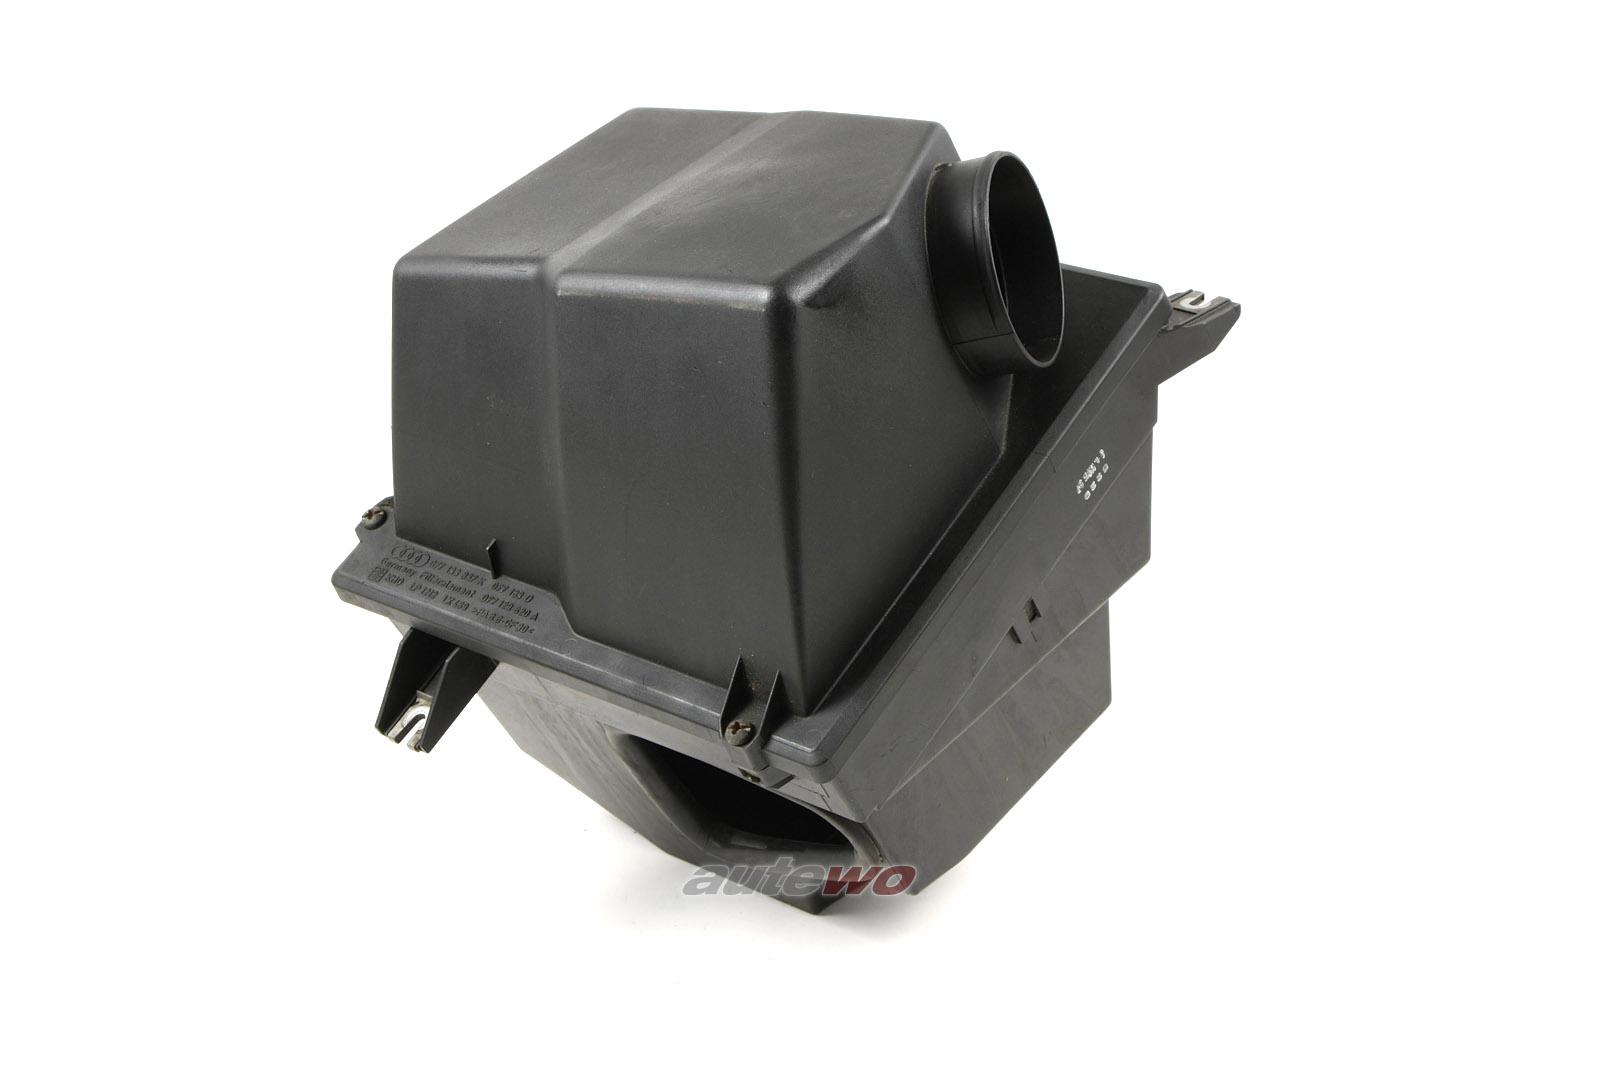 077133837L 077133837K Audi S6+ C4 4.2l Luftfilterkasten